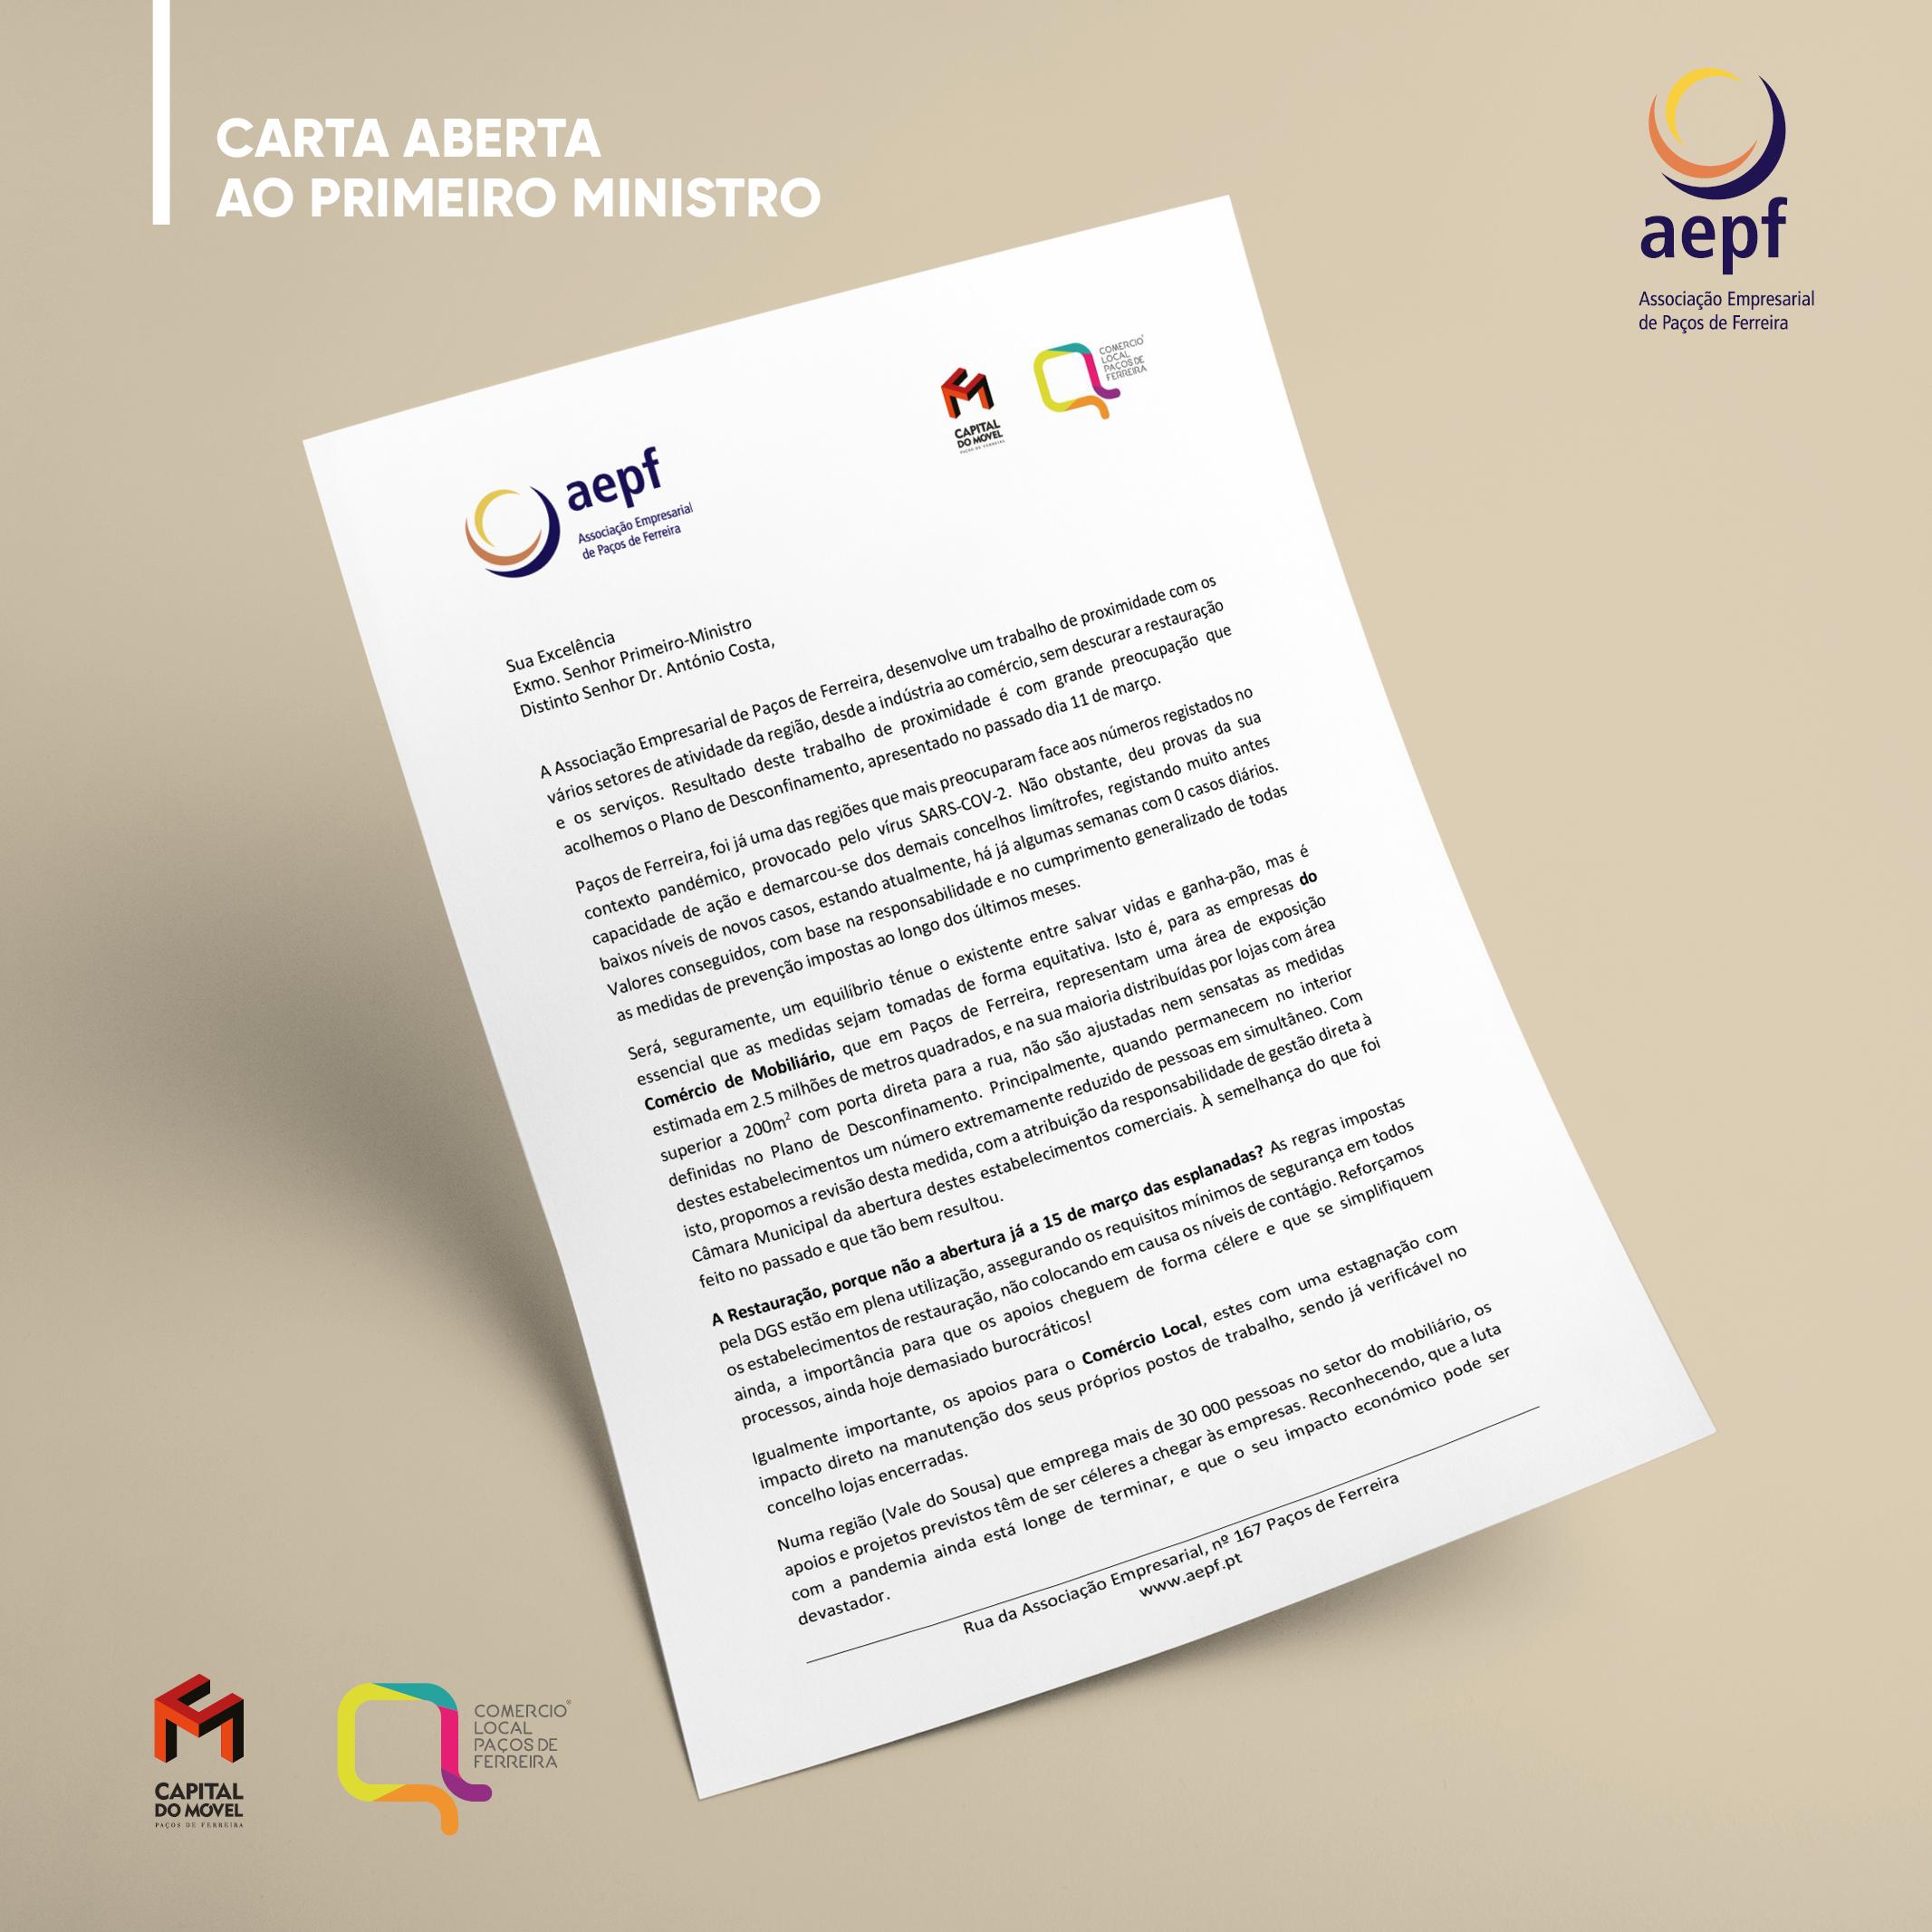 Carta Aberta ao Primeiro Ministro